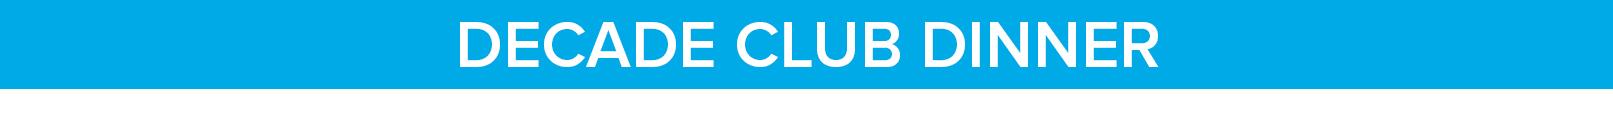 TitleBars_Blue_DecadeClubDinner.jpg